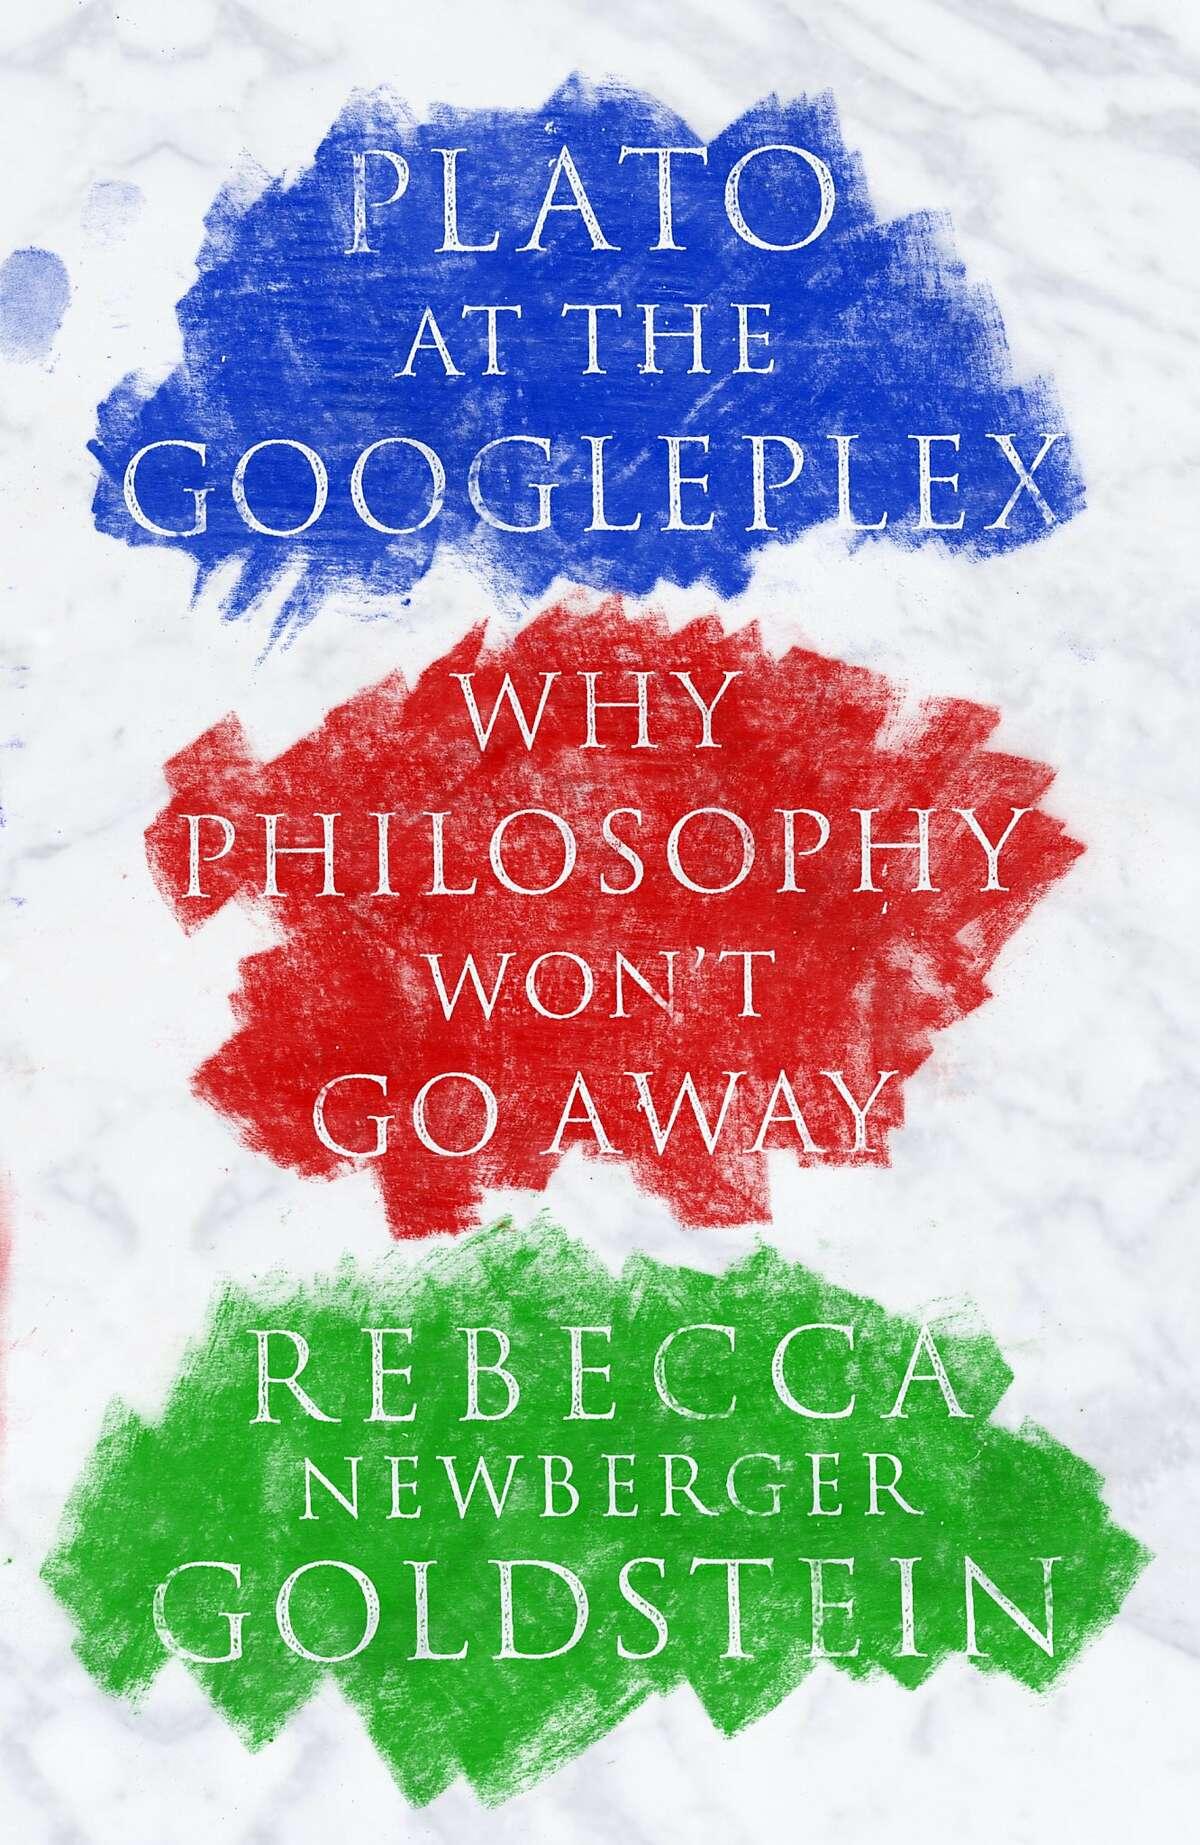 """Plato at the Googleplex: Why Philosophy Won't Go Away,"" by Rebecca Newberger Goldstein"